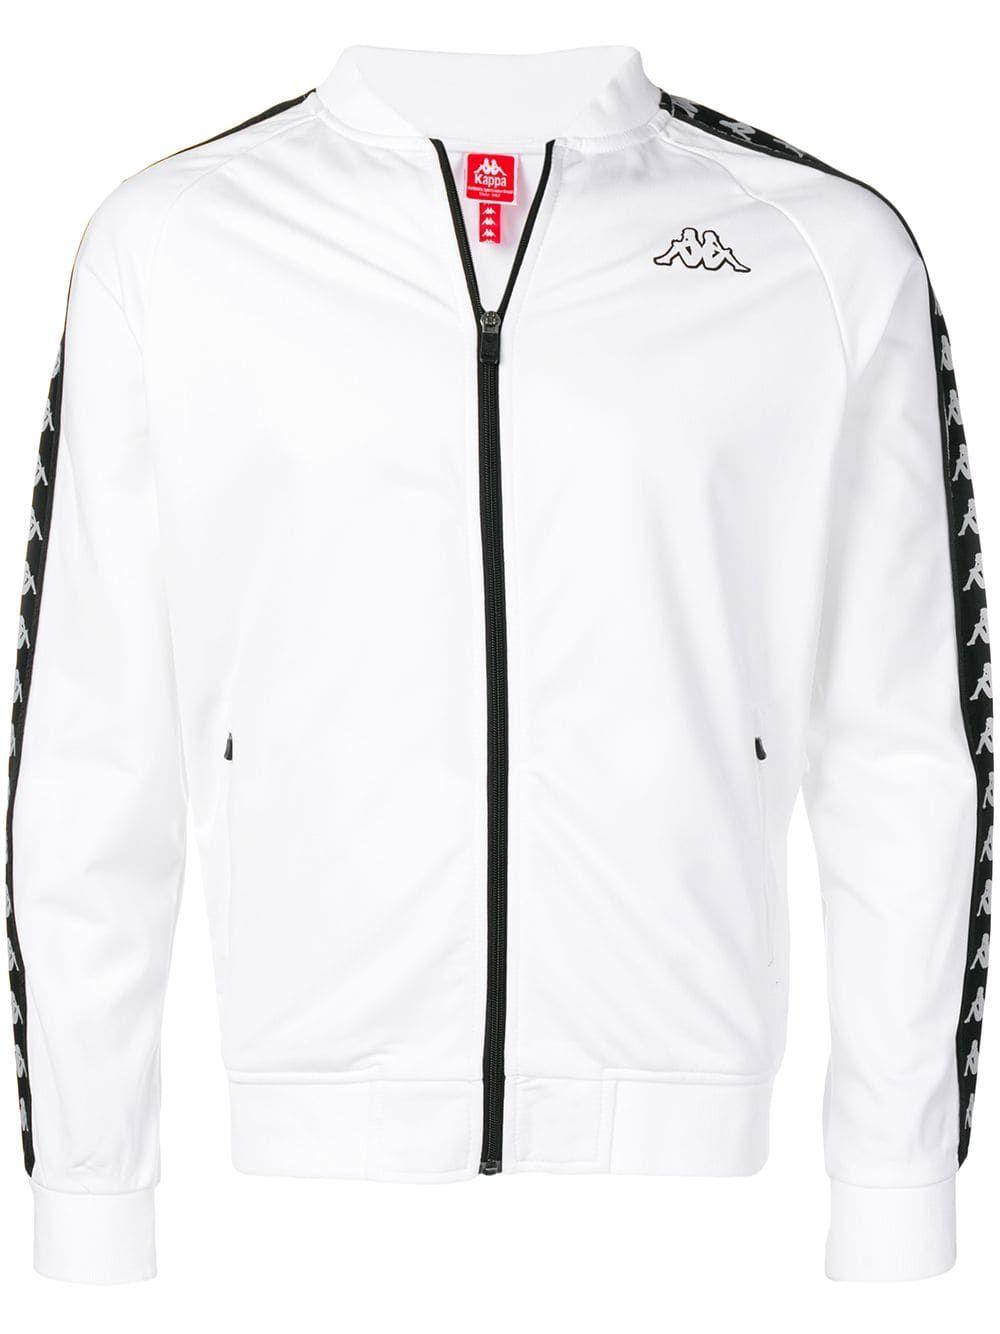 Kappa Bomber In White Modesens White Sweatshirt Trendy Sweatshirt Sweatshirt Street Style [ 1334 x 1000 Pixel ]